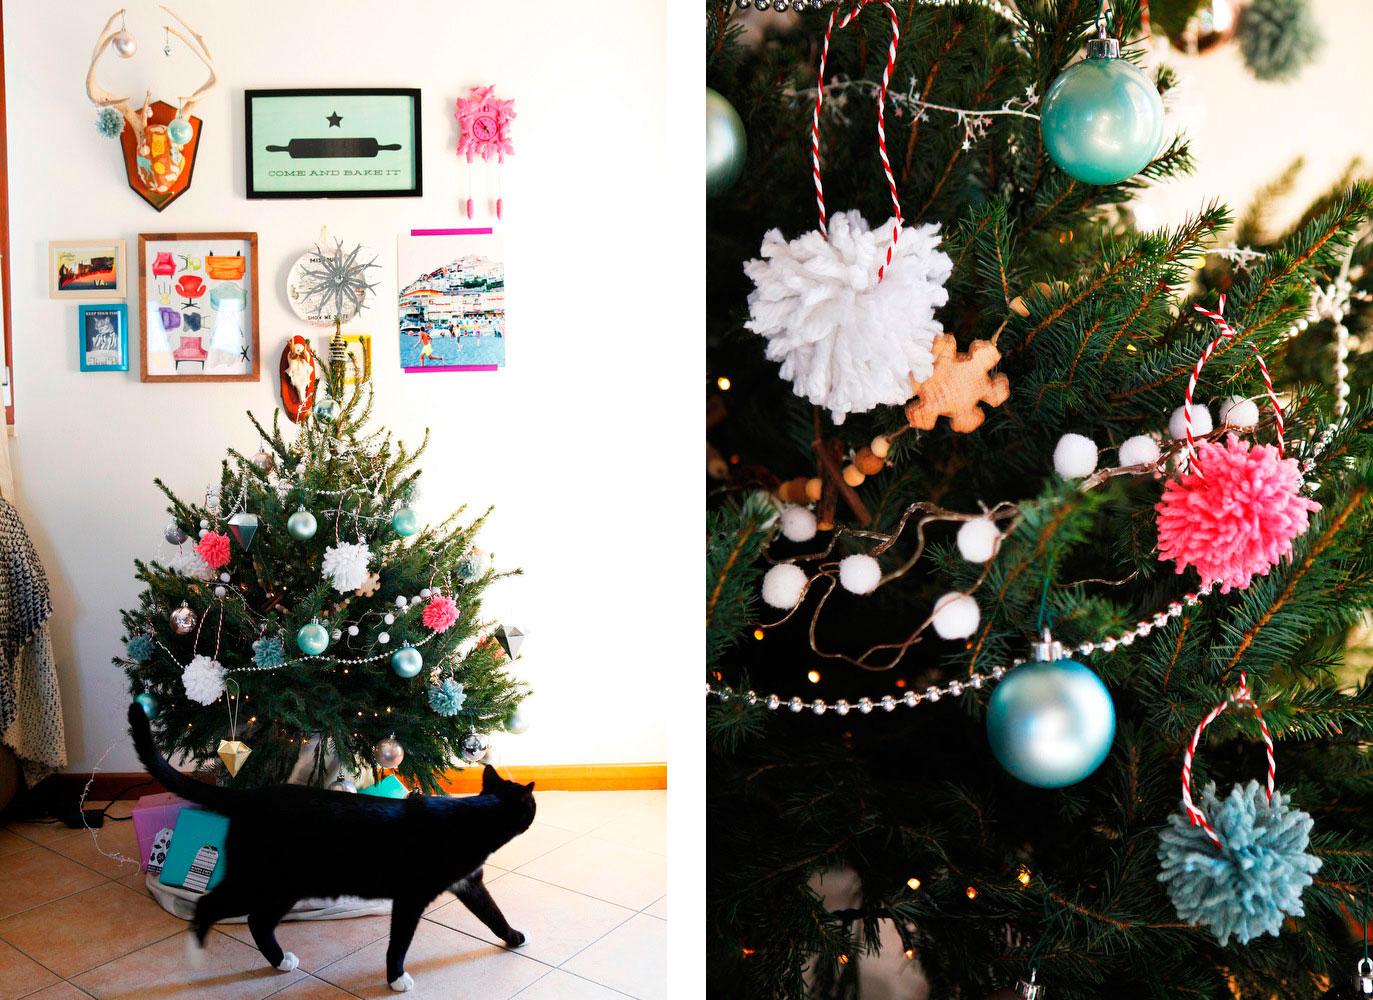 Diy Yarn Pom Pom Christmas Tree Ornaments Freckle Fair Recipes Diy Tutorials Travel Guides And General Awesomeness